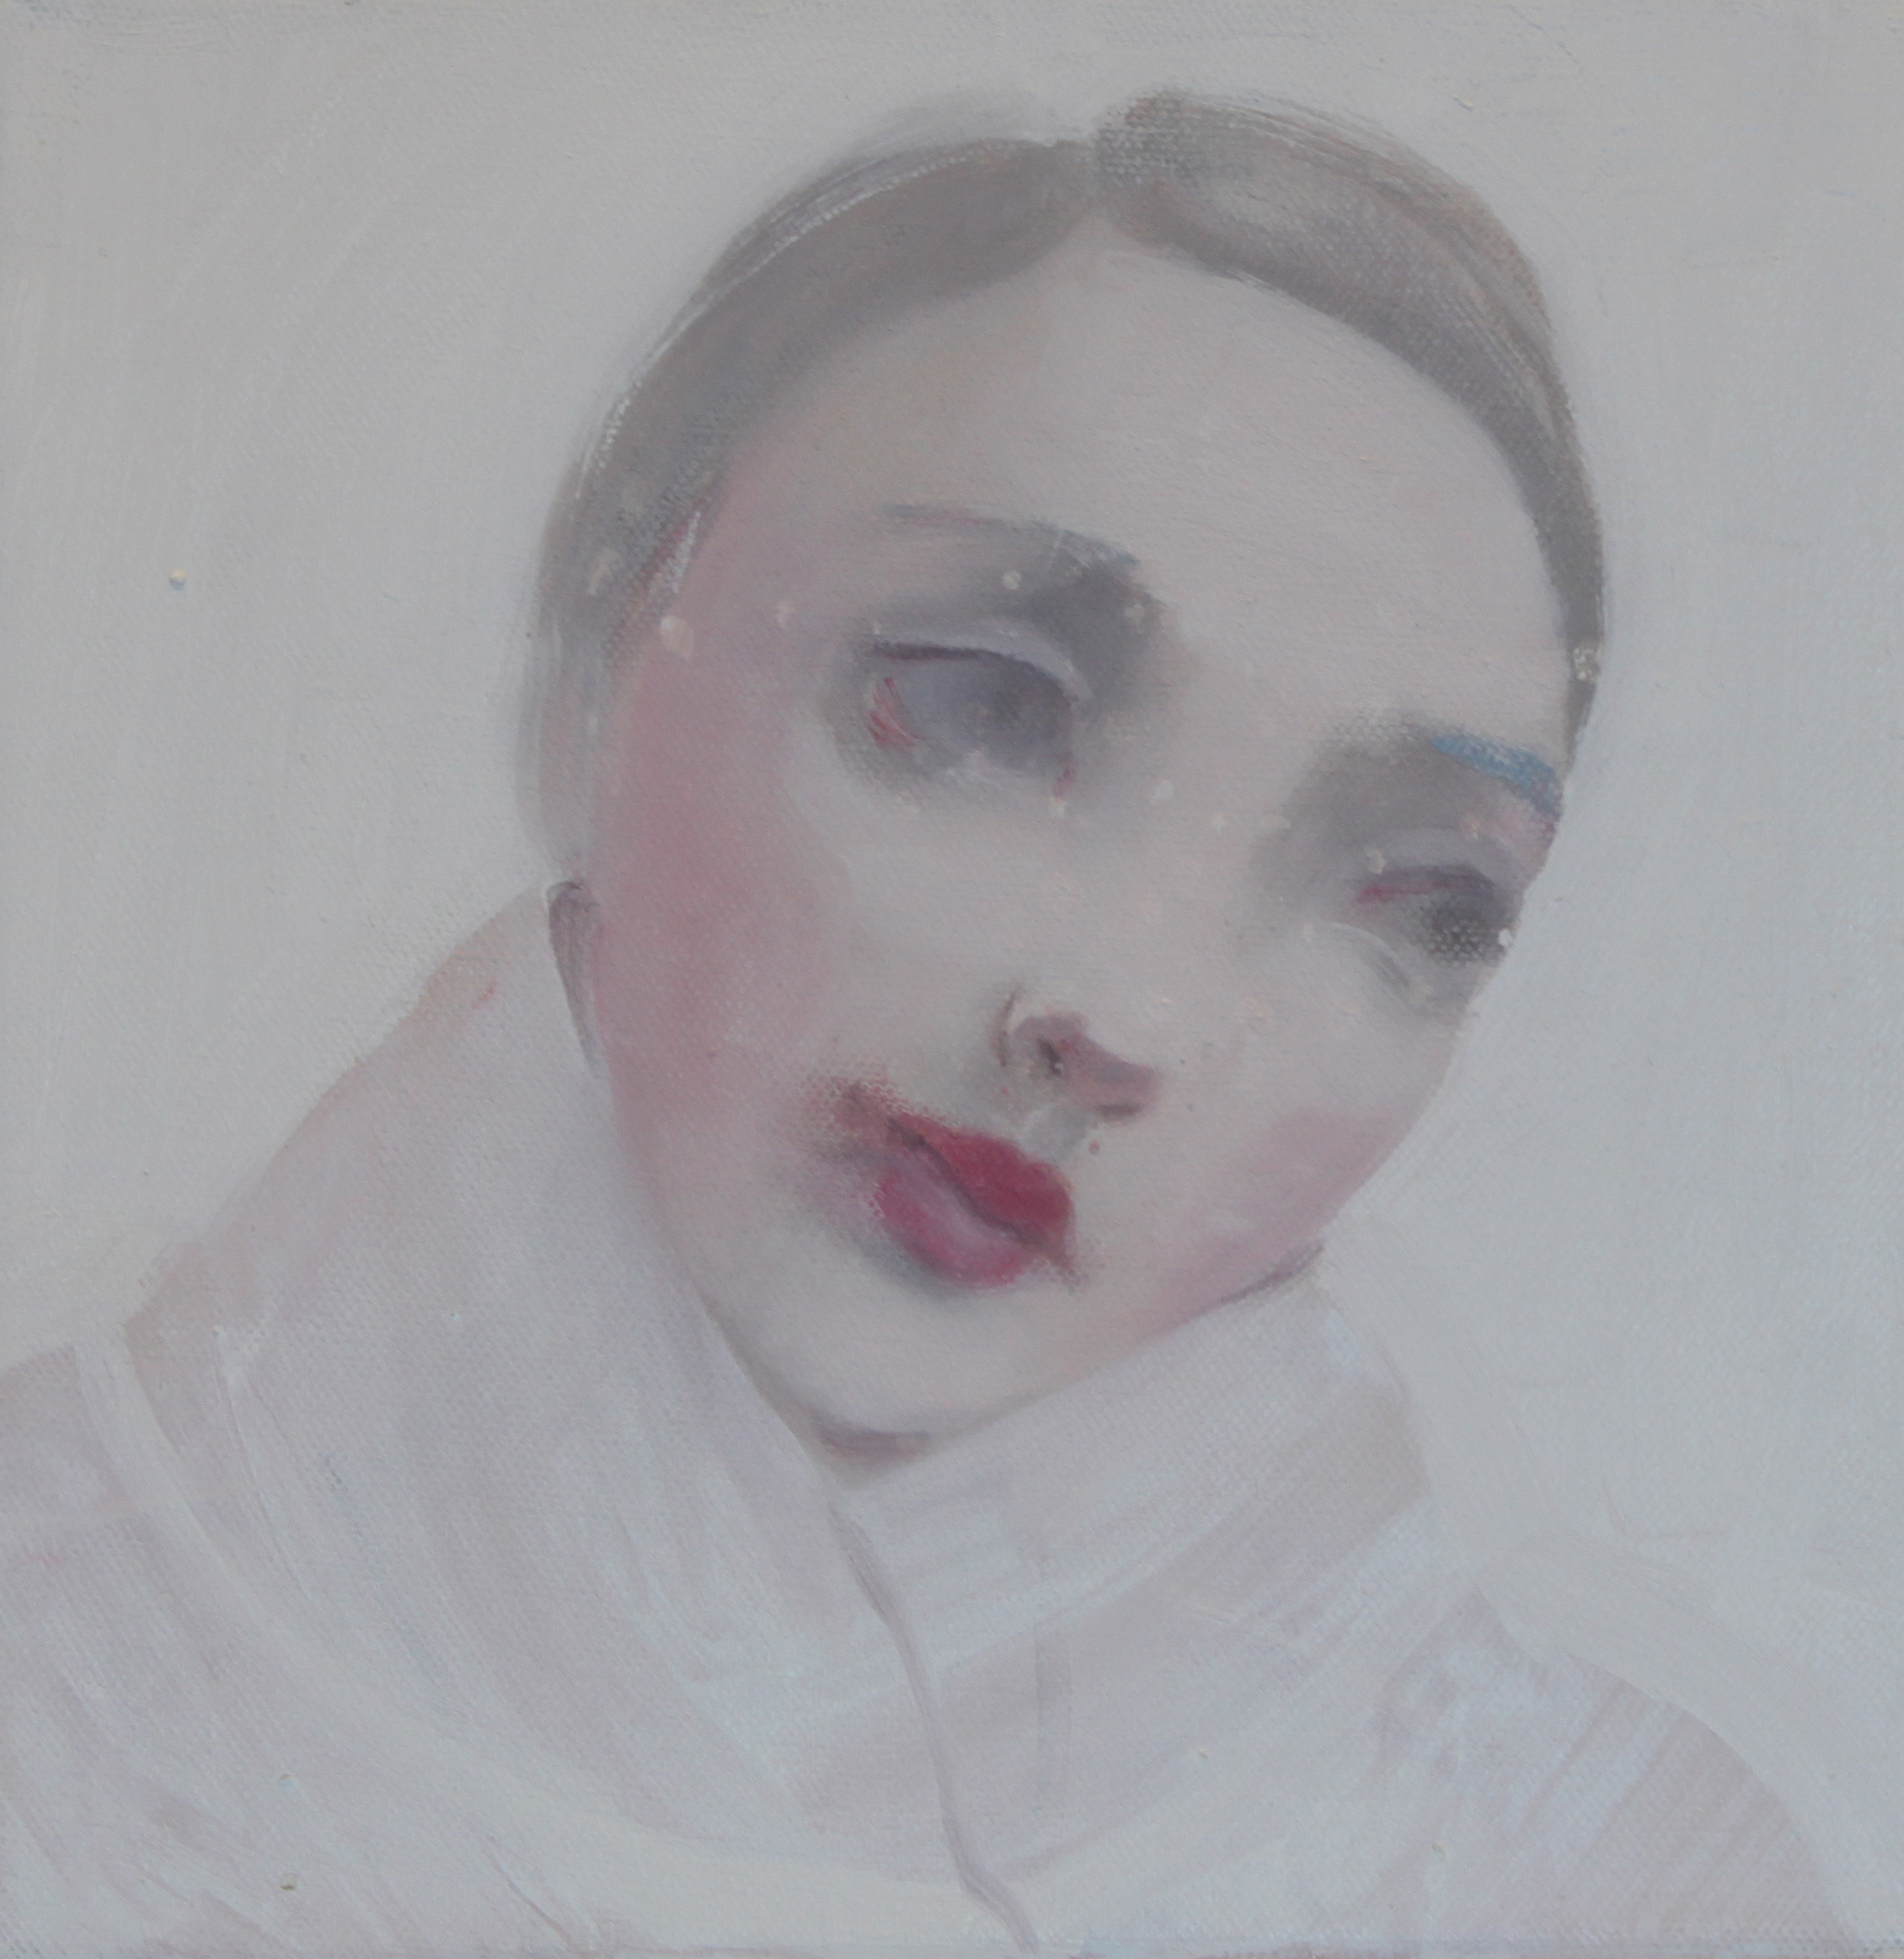 K r i s t i n V e s t g a r d  Through The Day 25 x 25 cm oil on canvas £ 900